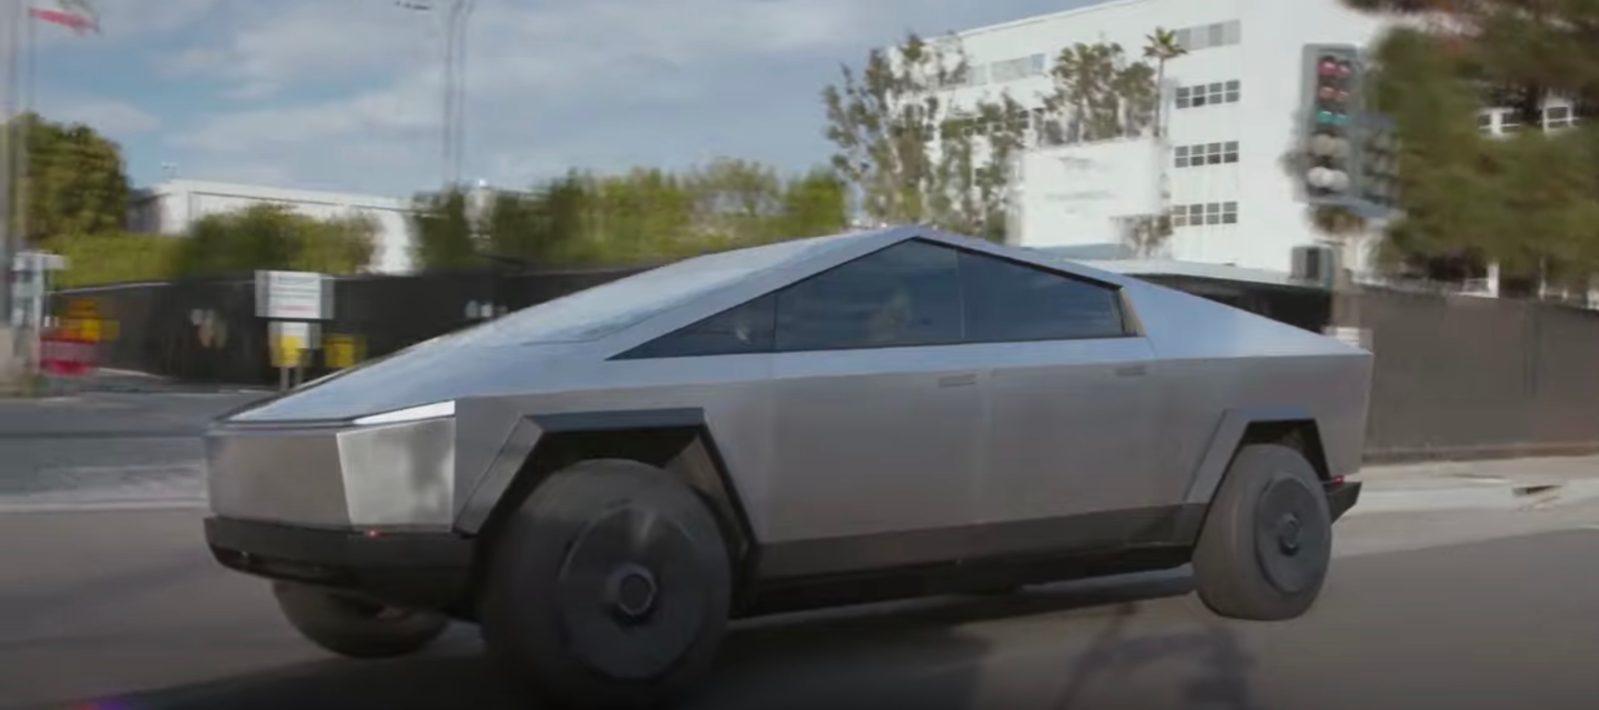 Elon Musk on Tesla Cybertruck: 'The goal is to kick most ...